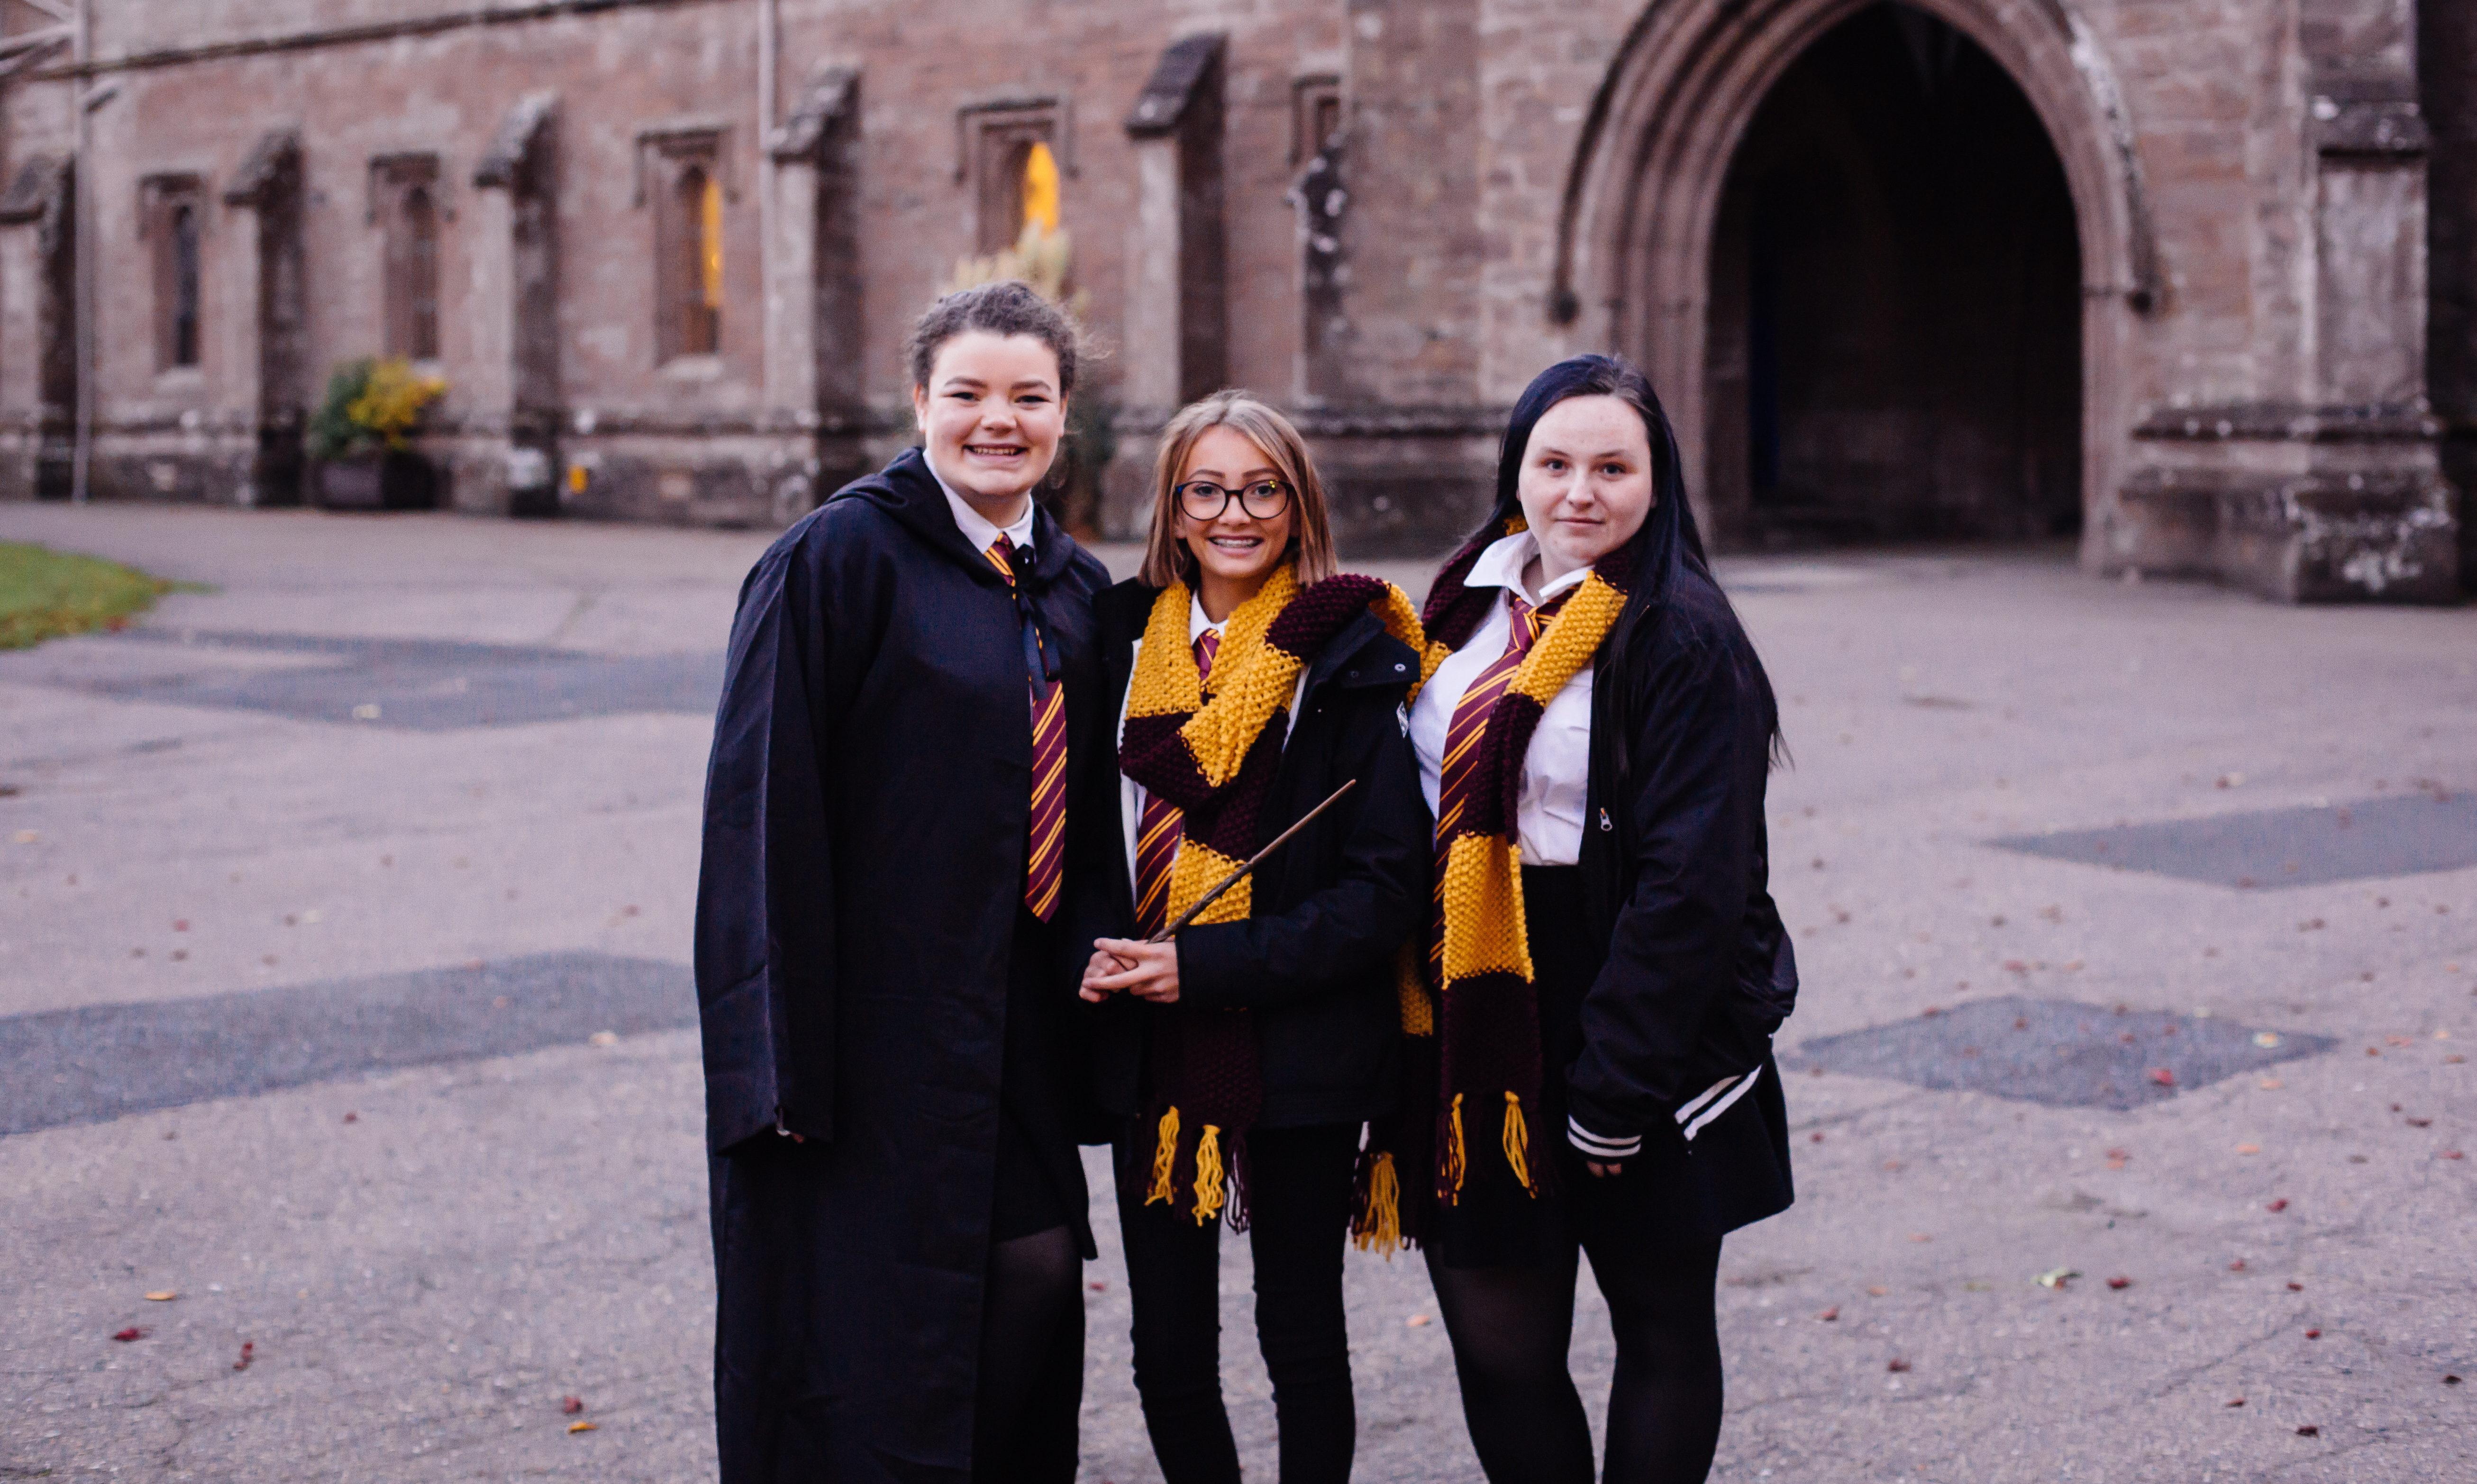 From right to left, volunteers Rhona Jack, Jodie McKenzie and Jade Delaney dressed as Hogwarts pupils